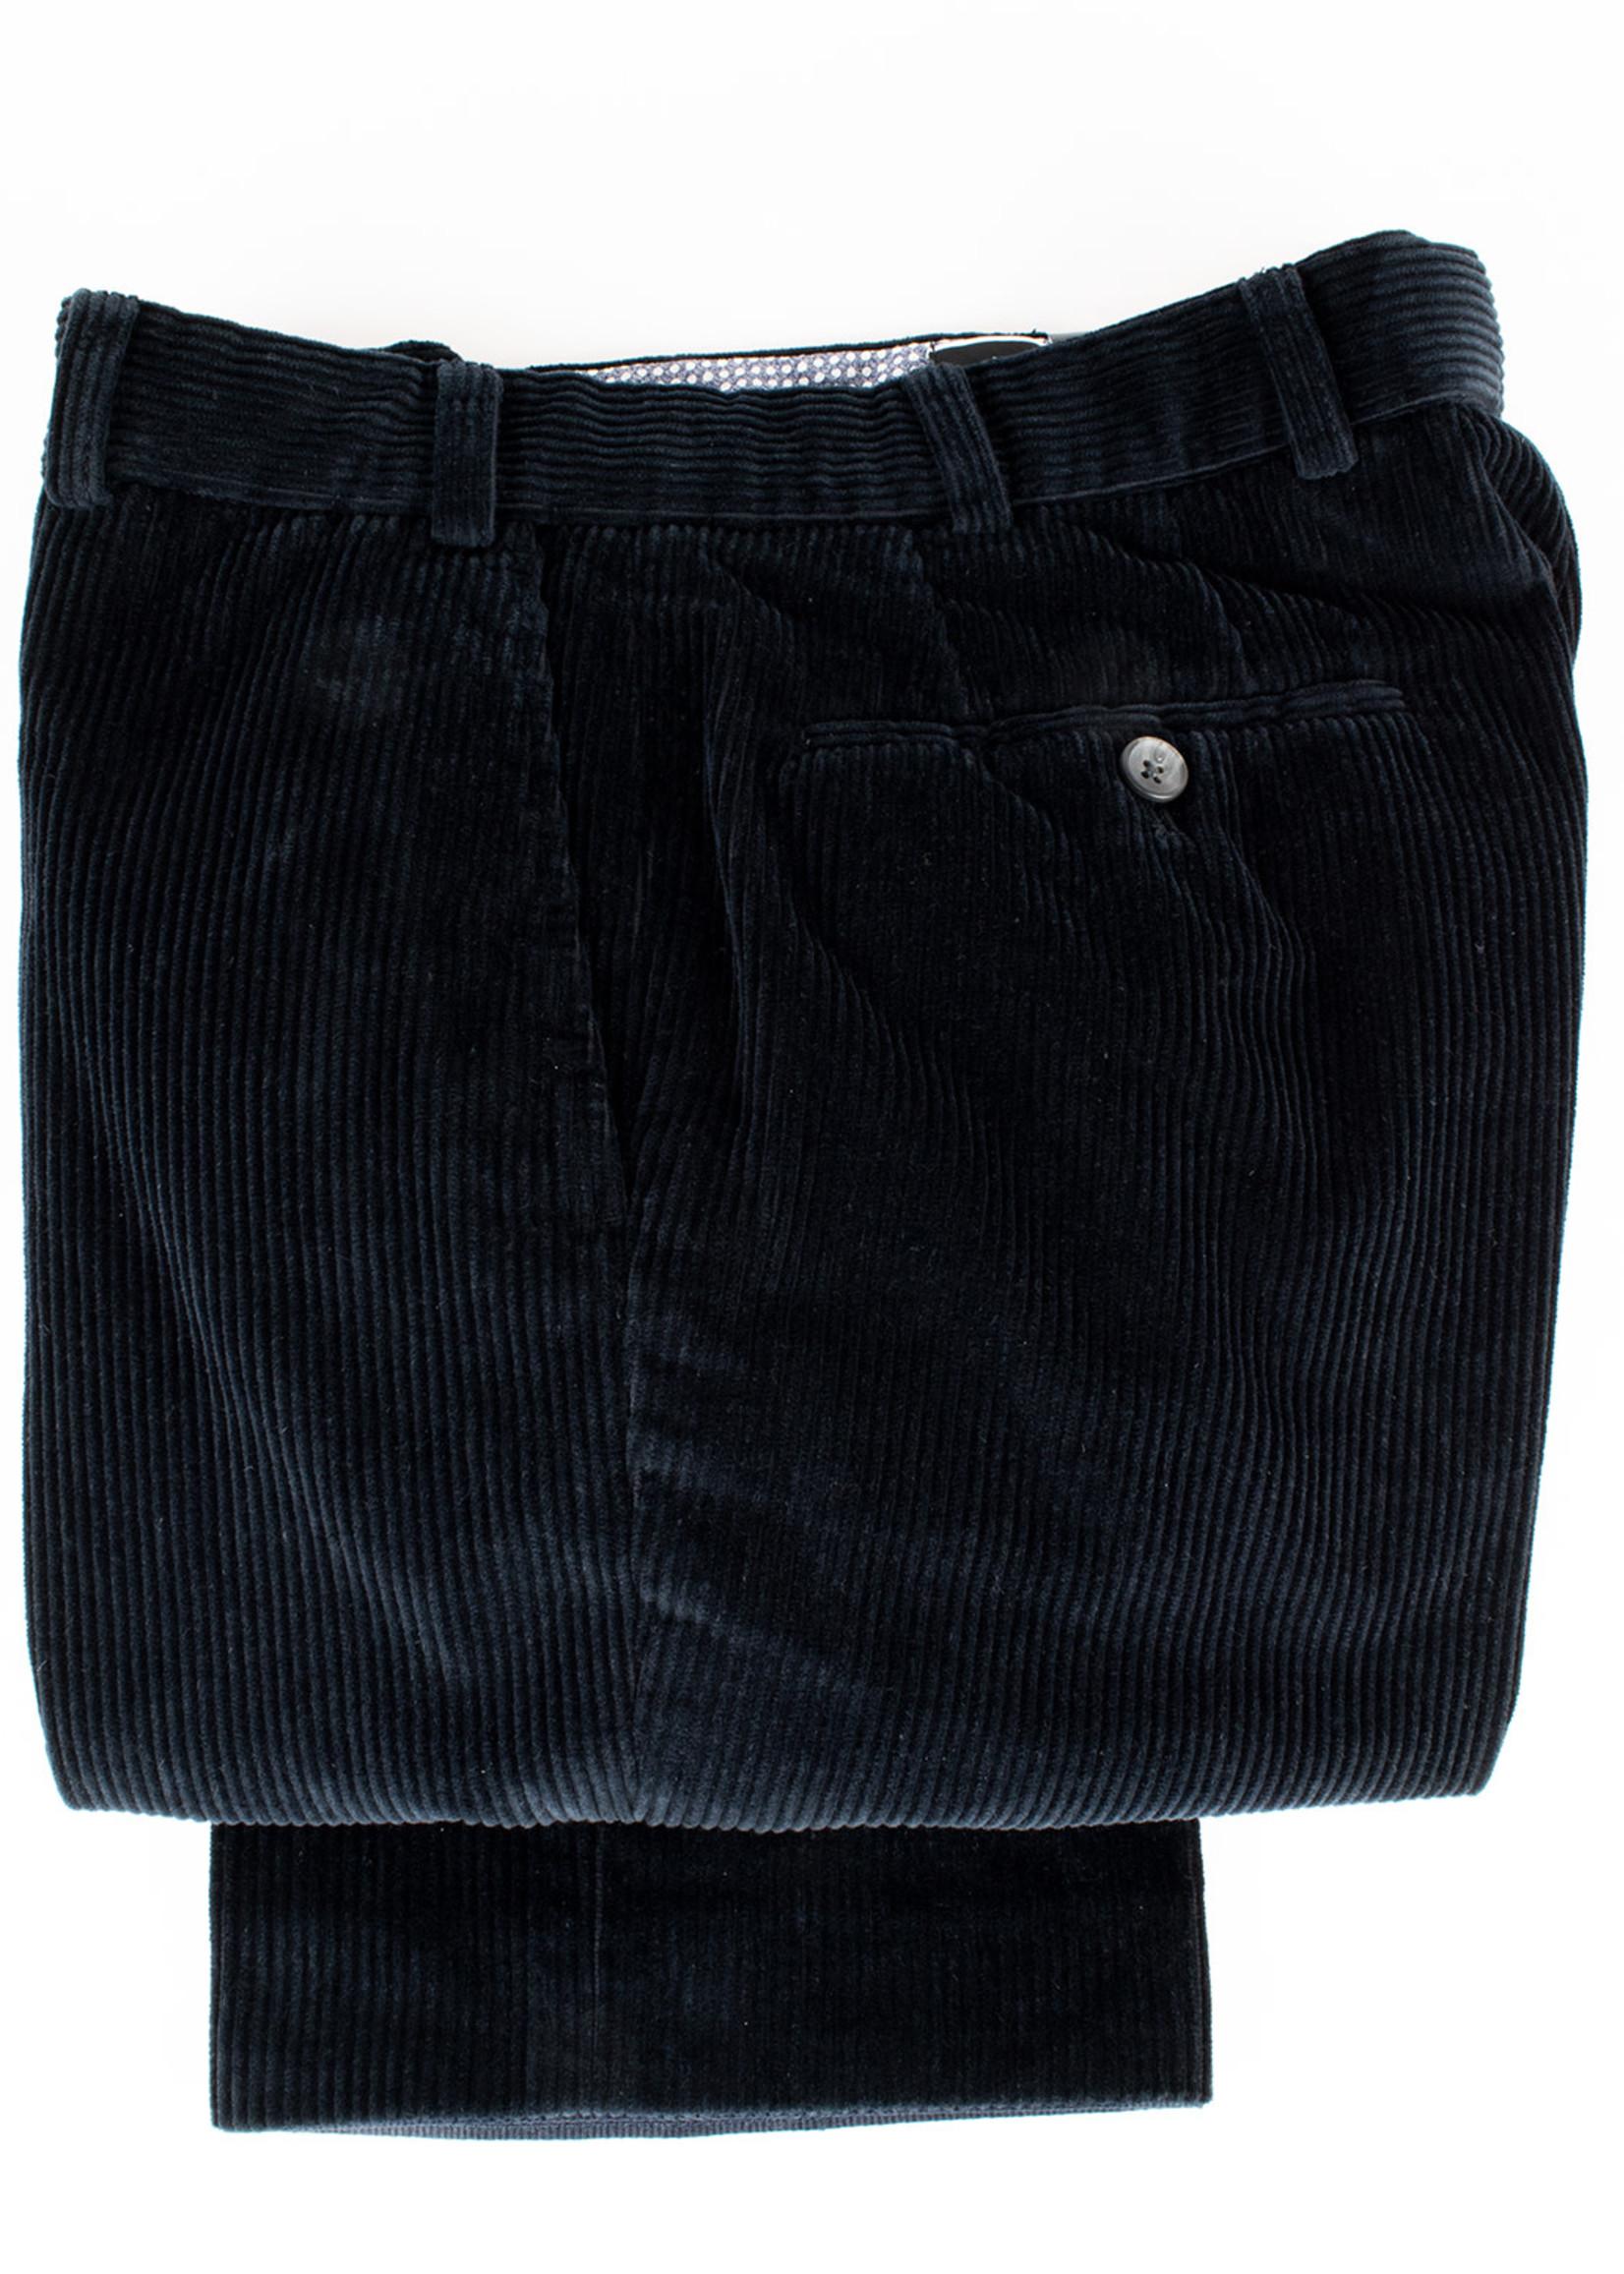 Hiltl Hiltl Parma Pant Black Wide Wale Corduroy